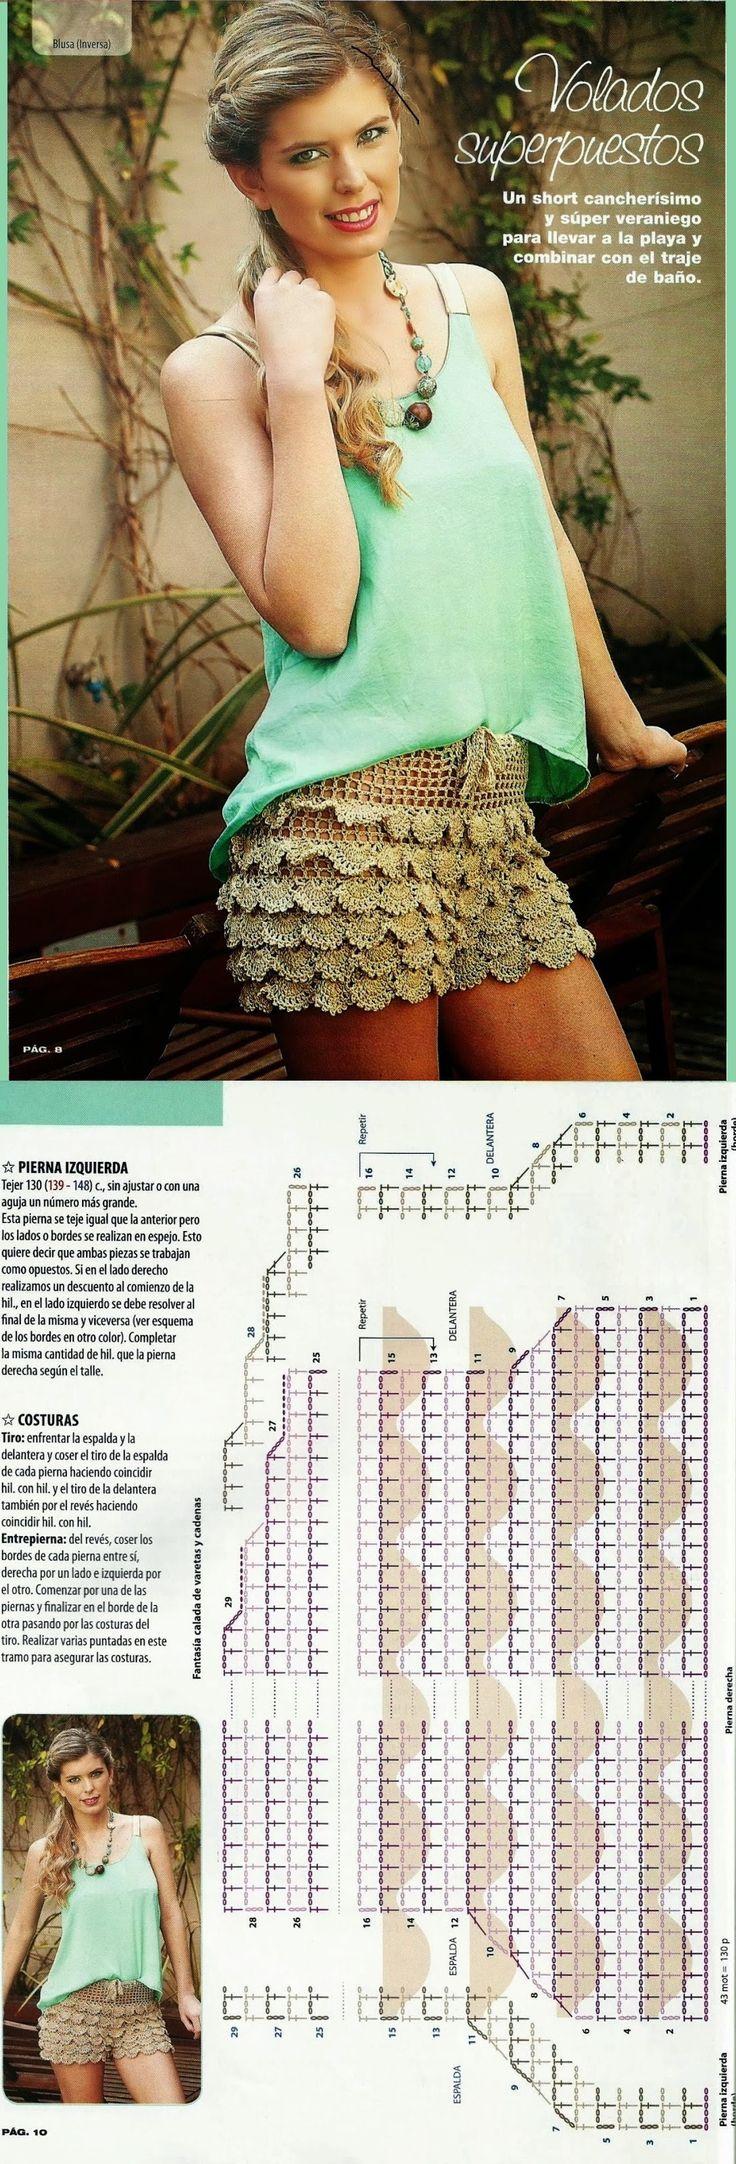 Pantalones cortos de escamas de crochet ♪ ♪ ... #inspiration #diy GB http://www.pinterest.com/gigibrazil/boards/